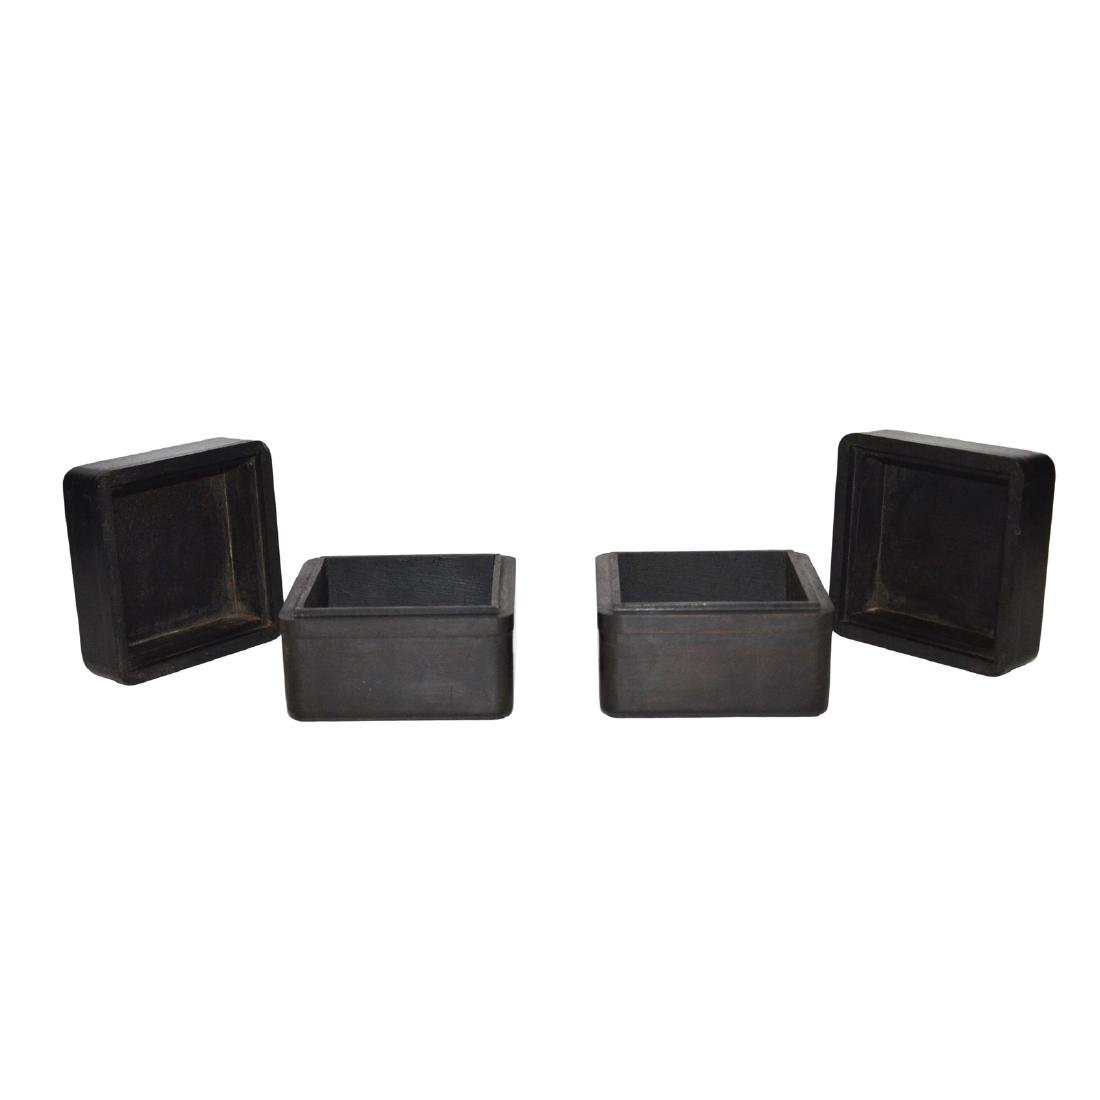 Qing, A Pair of Small Zitan Square Box - 4